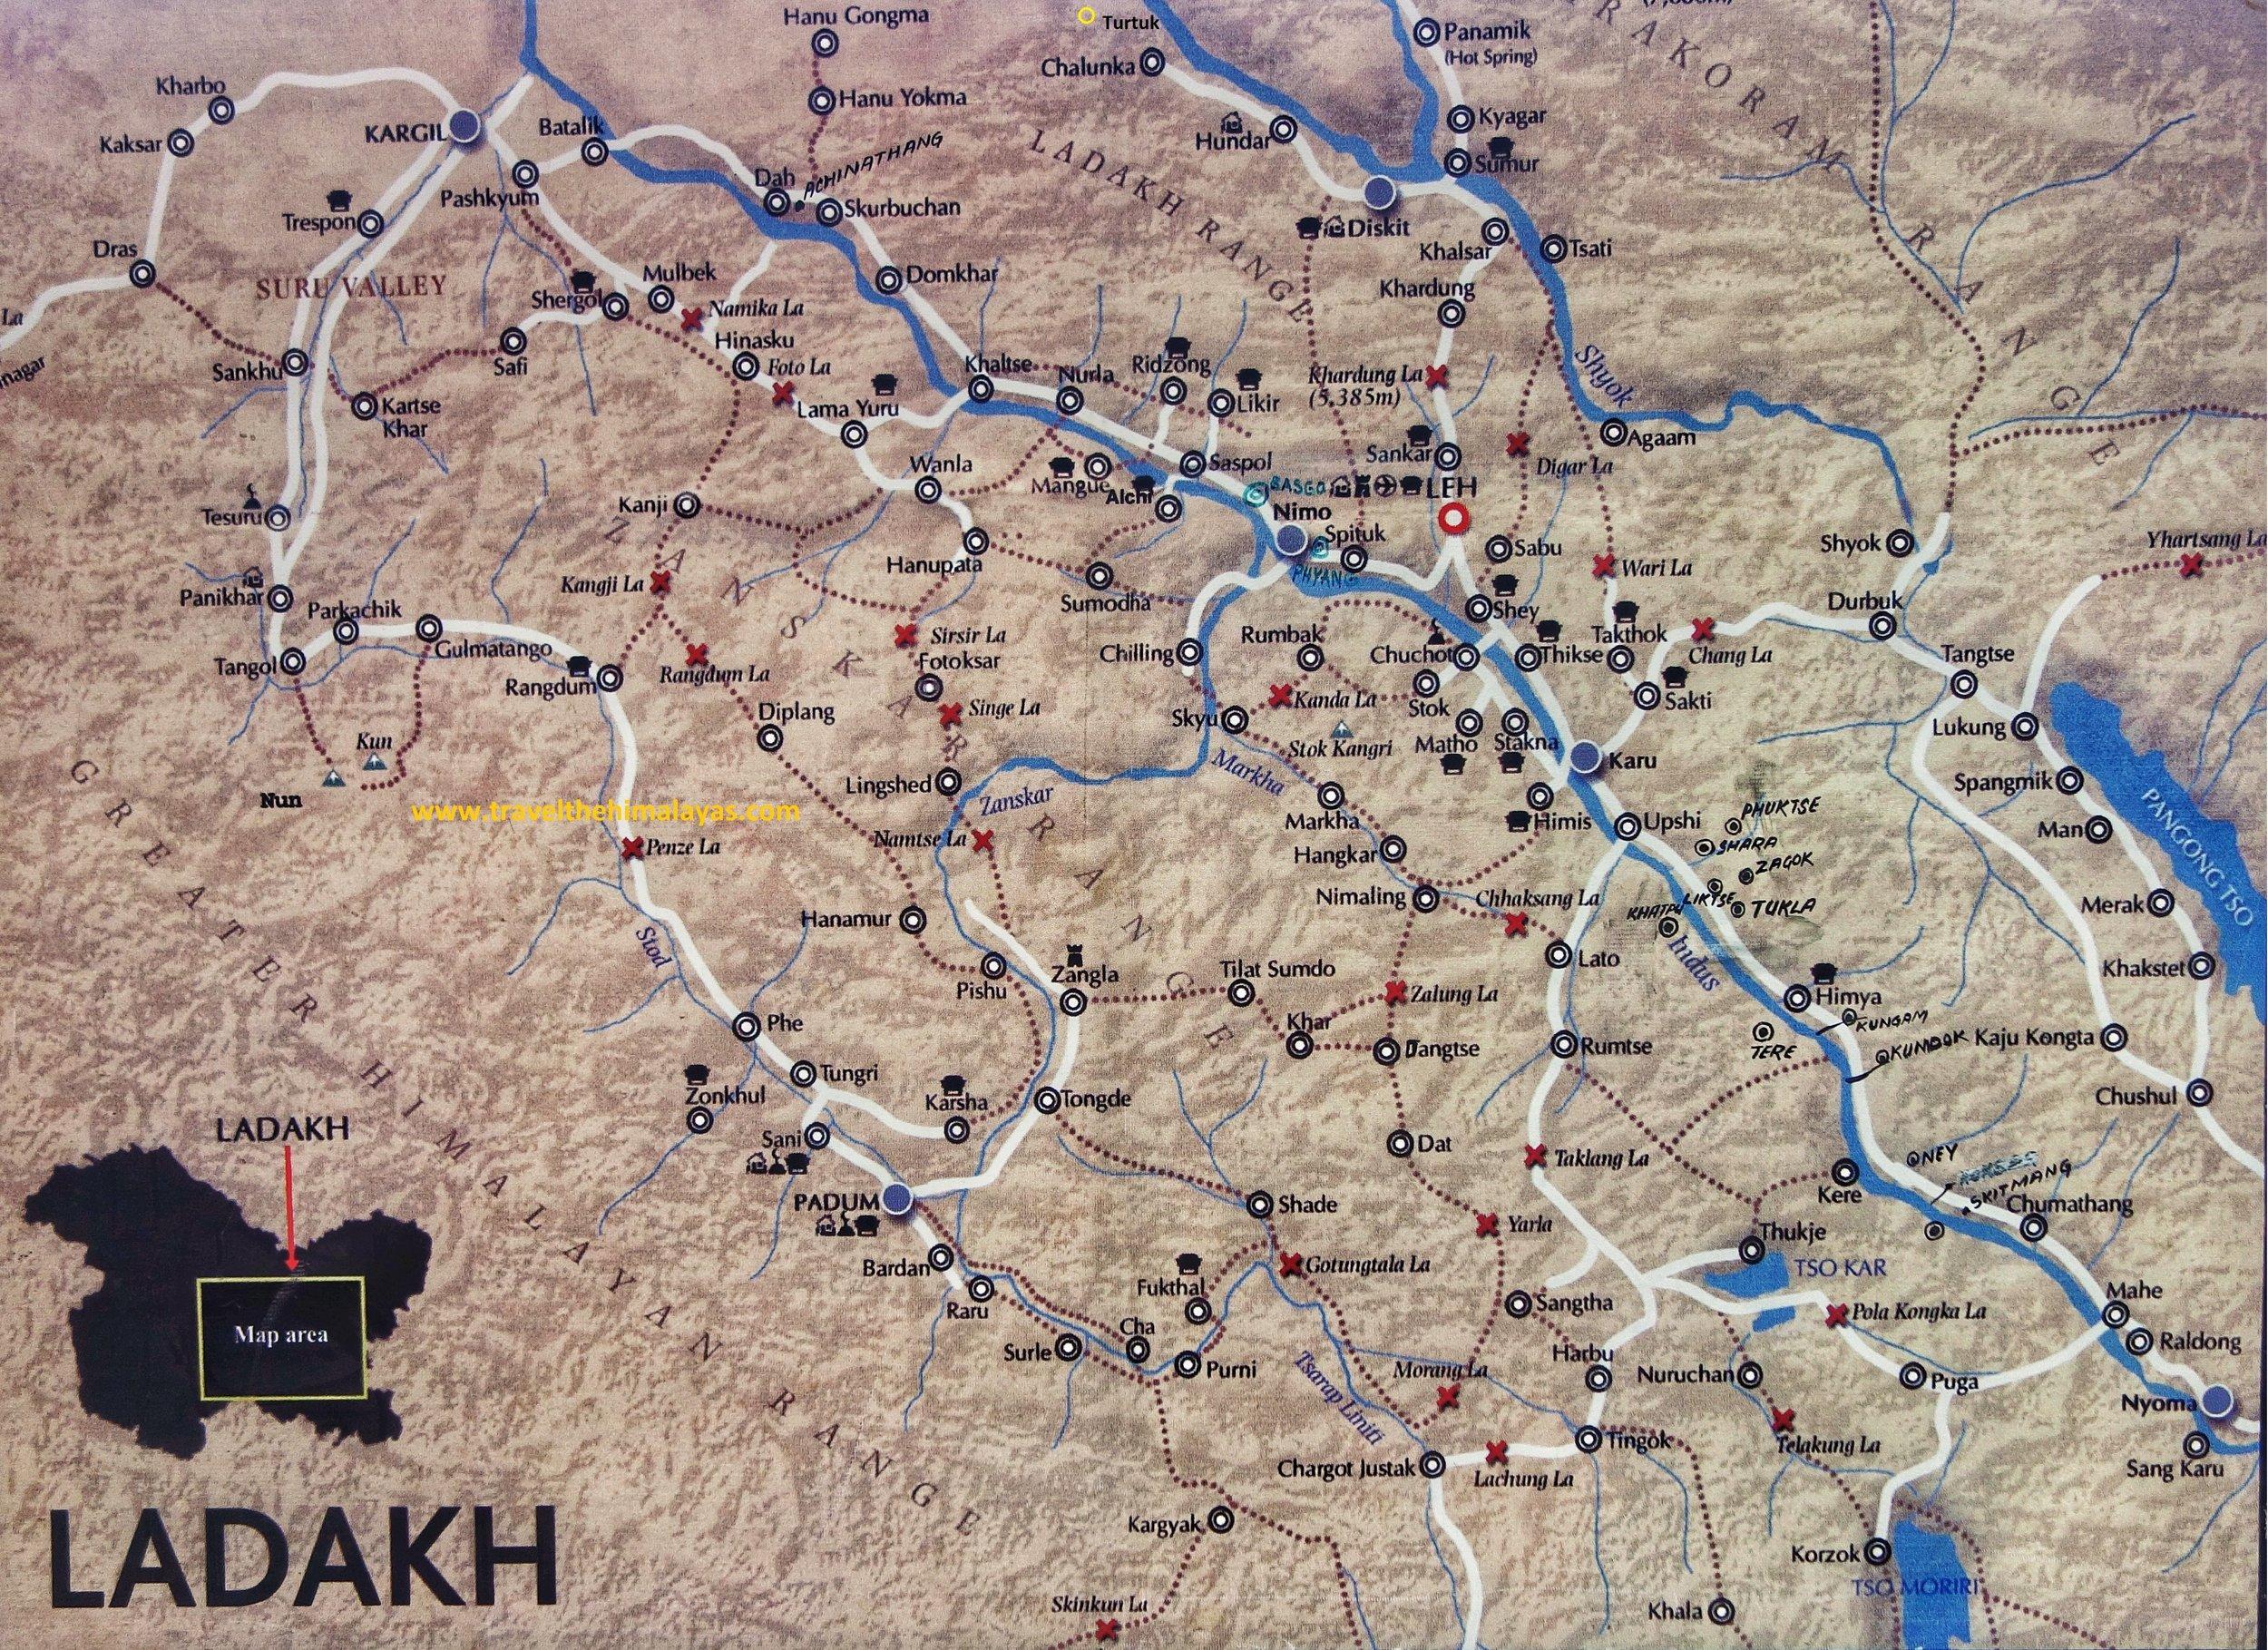 ladakh-map-detailed